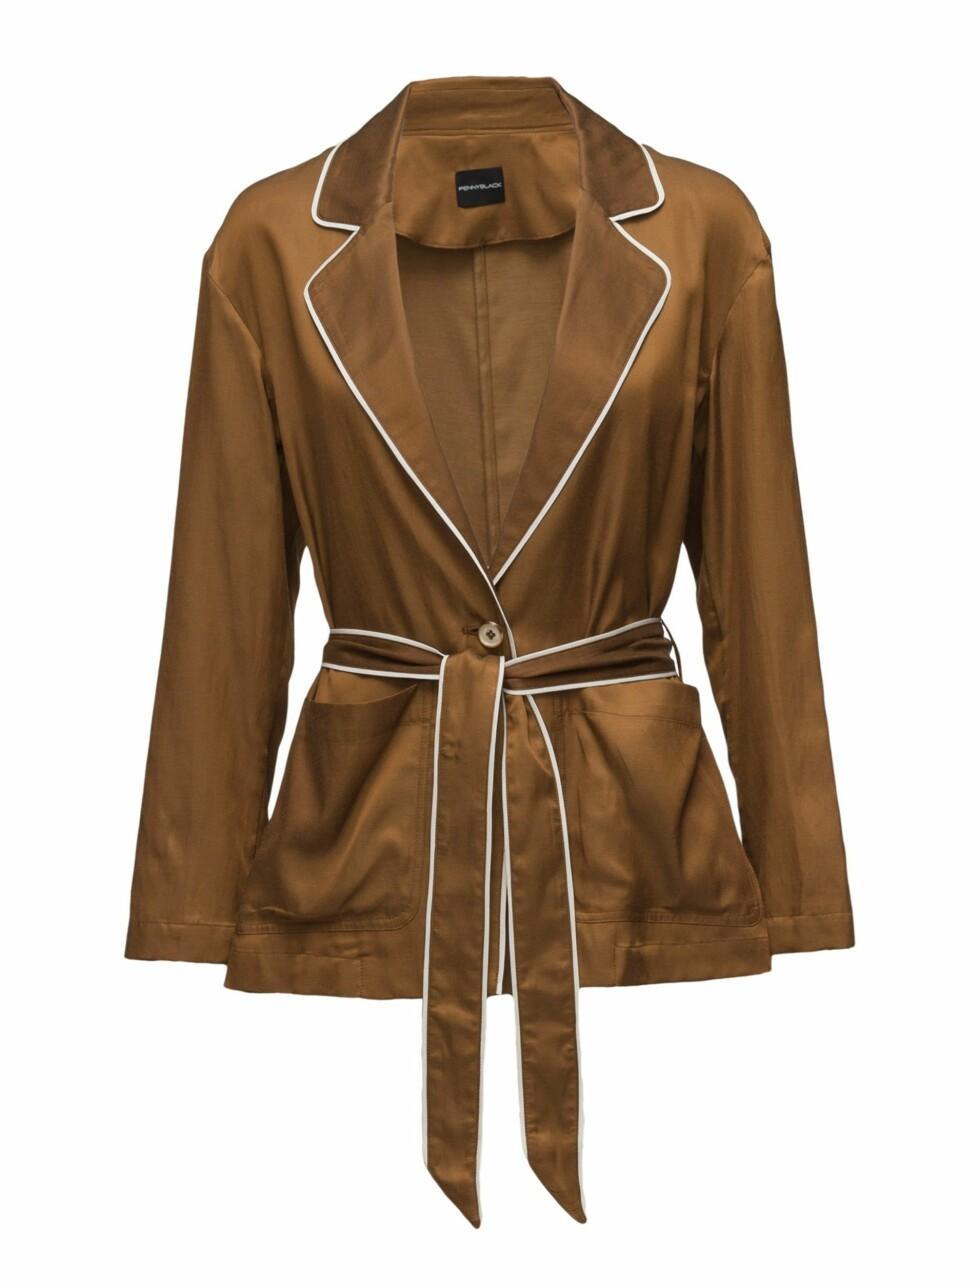 Brun, blank blazer fra |Pennyblack|http://clk.tradedoubler.com/click?p=227665&a=3009936&g=20804994&url=https://www.boozt.com/no/no/penny-black/baglio_15254543/15254548?navId=67363&sNavId=67450&group=listing&position=1000000